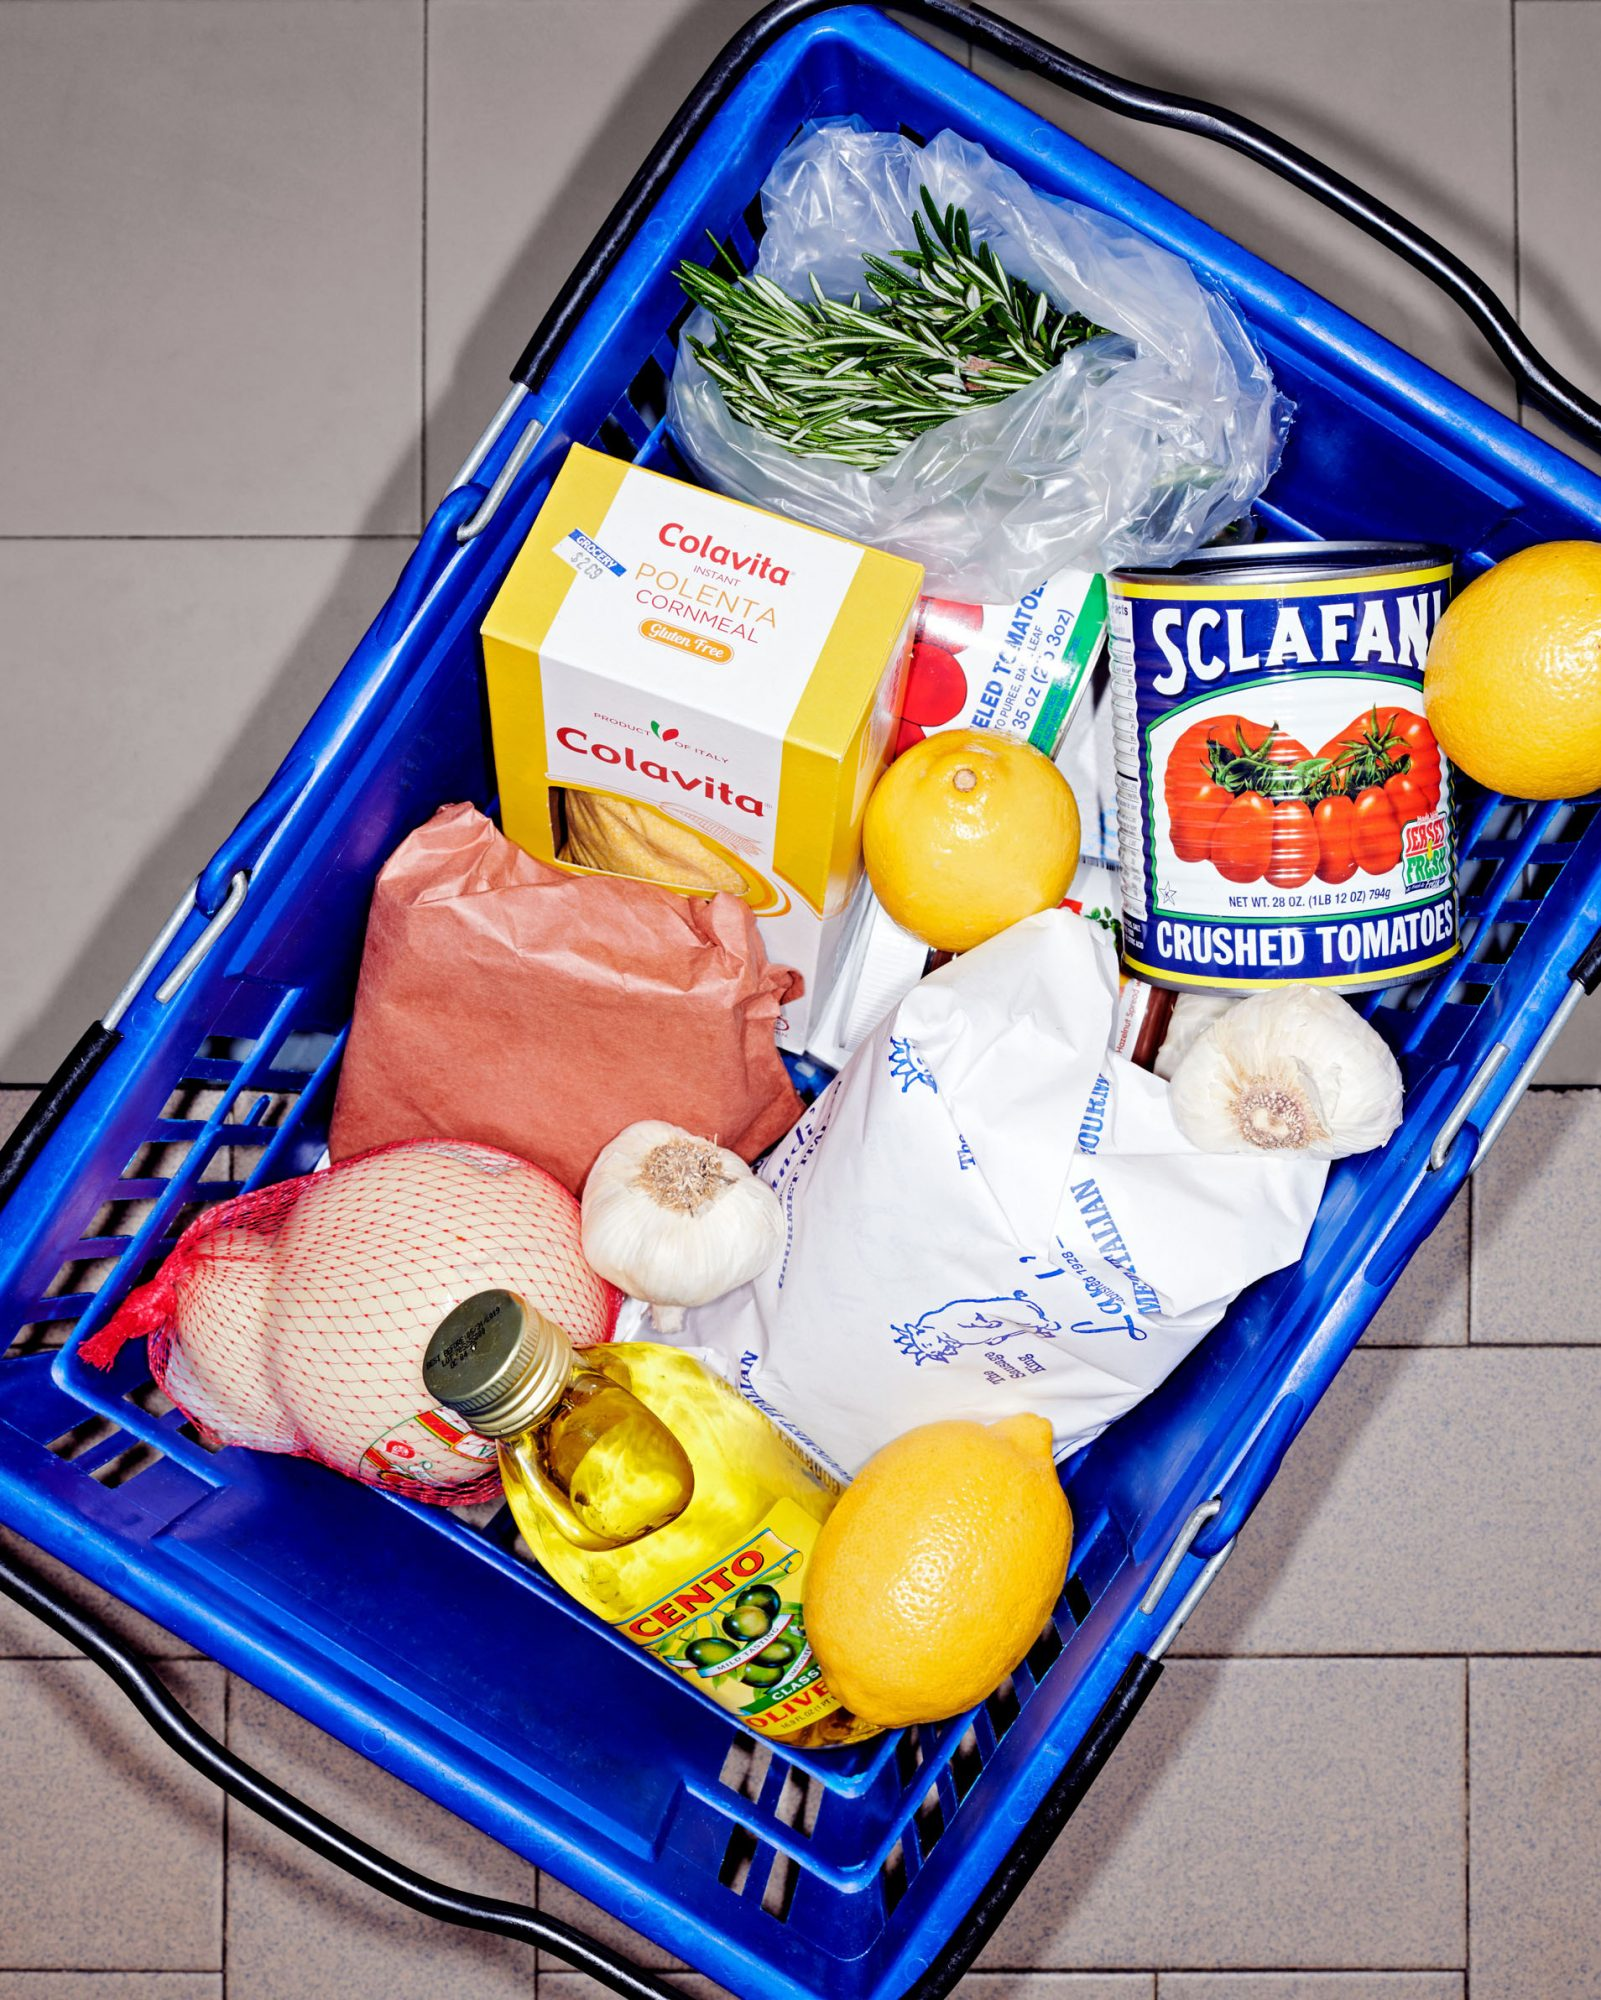 market basket of various ingredients